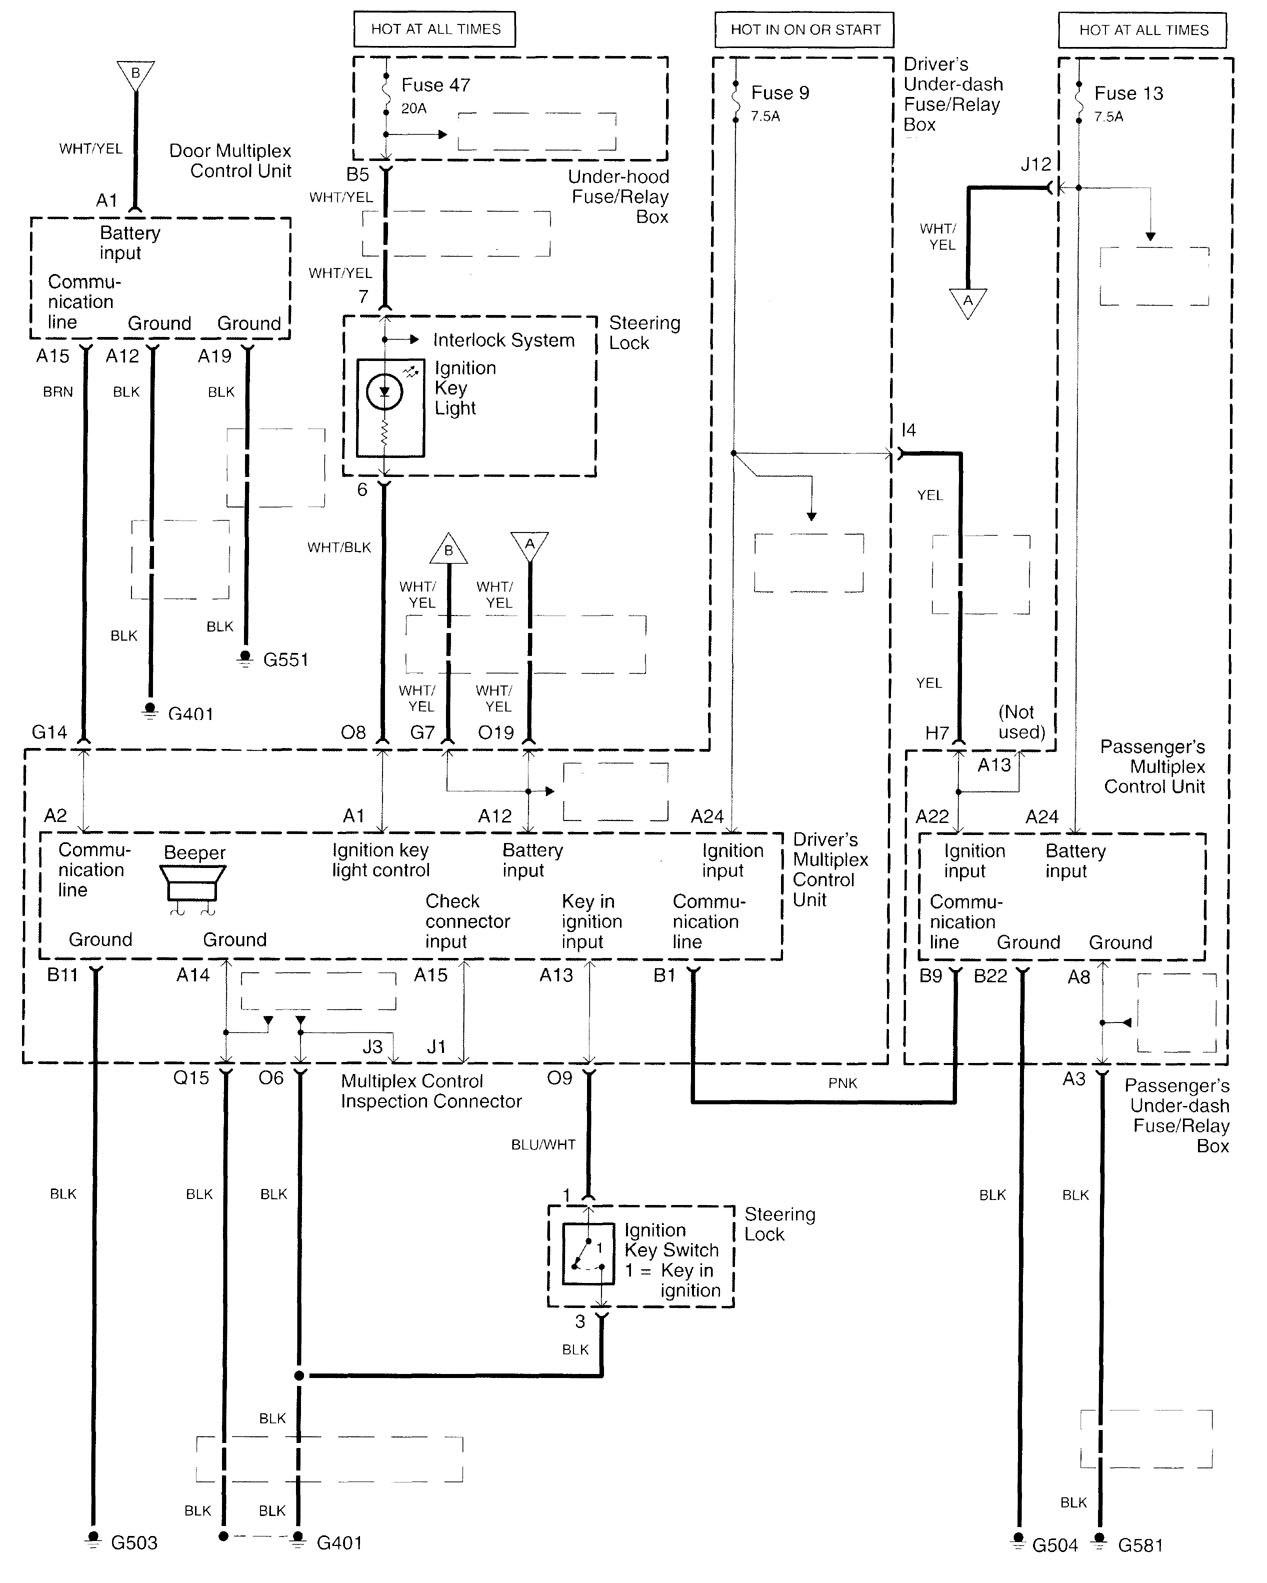 acura tl 2000 2001 wiring diagrams computer data. Black Bedroom Furniture Sets. Home Design Ideas